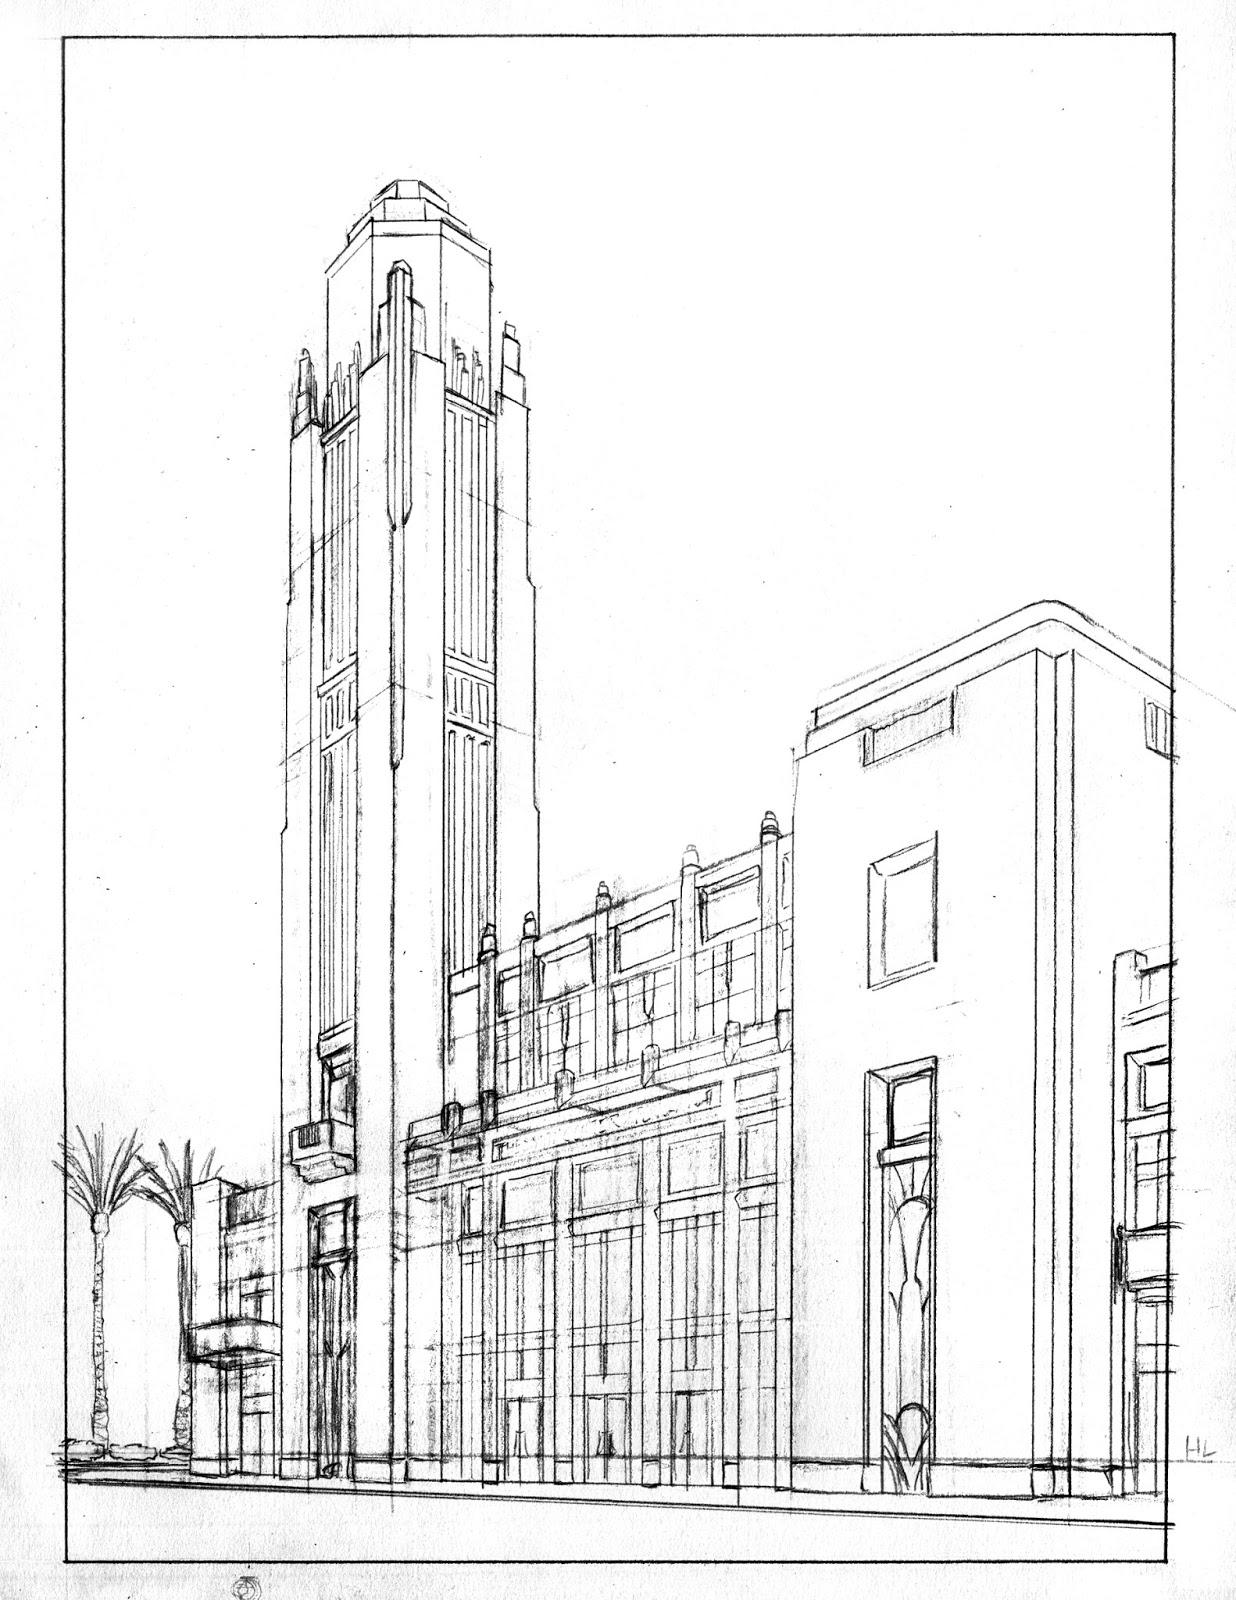 Work By Cazel Seqa325 Assignment 1 2pt Perspective Buildings Lva Main Building Amp The Las